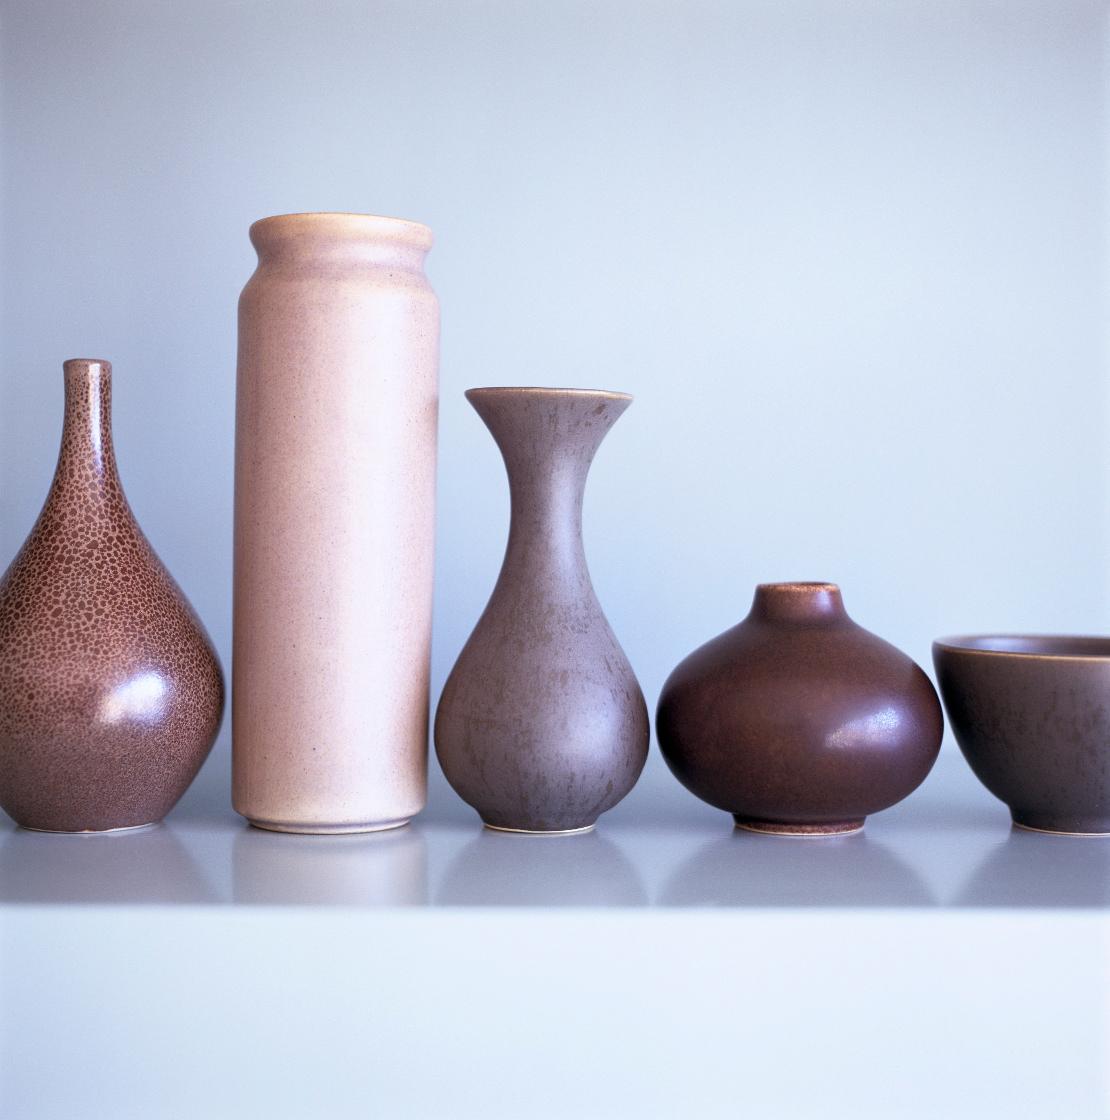 keramik-vasen-in-erdtönen